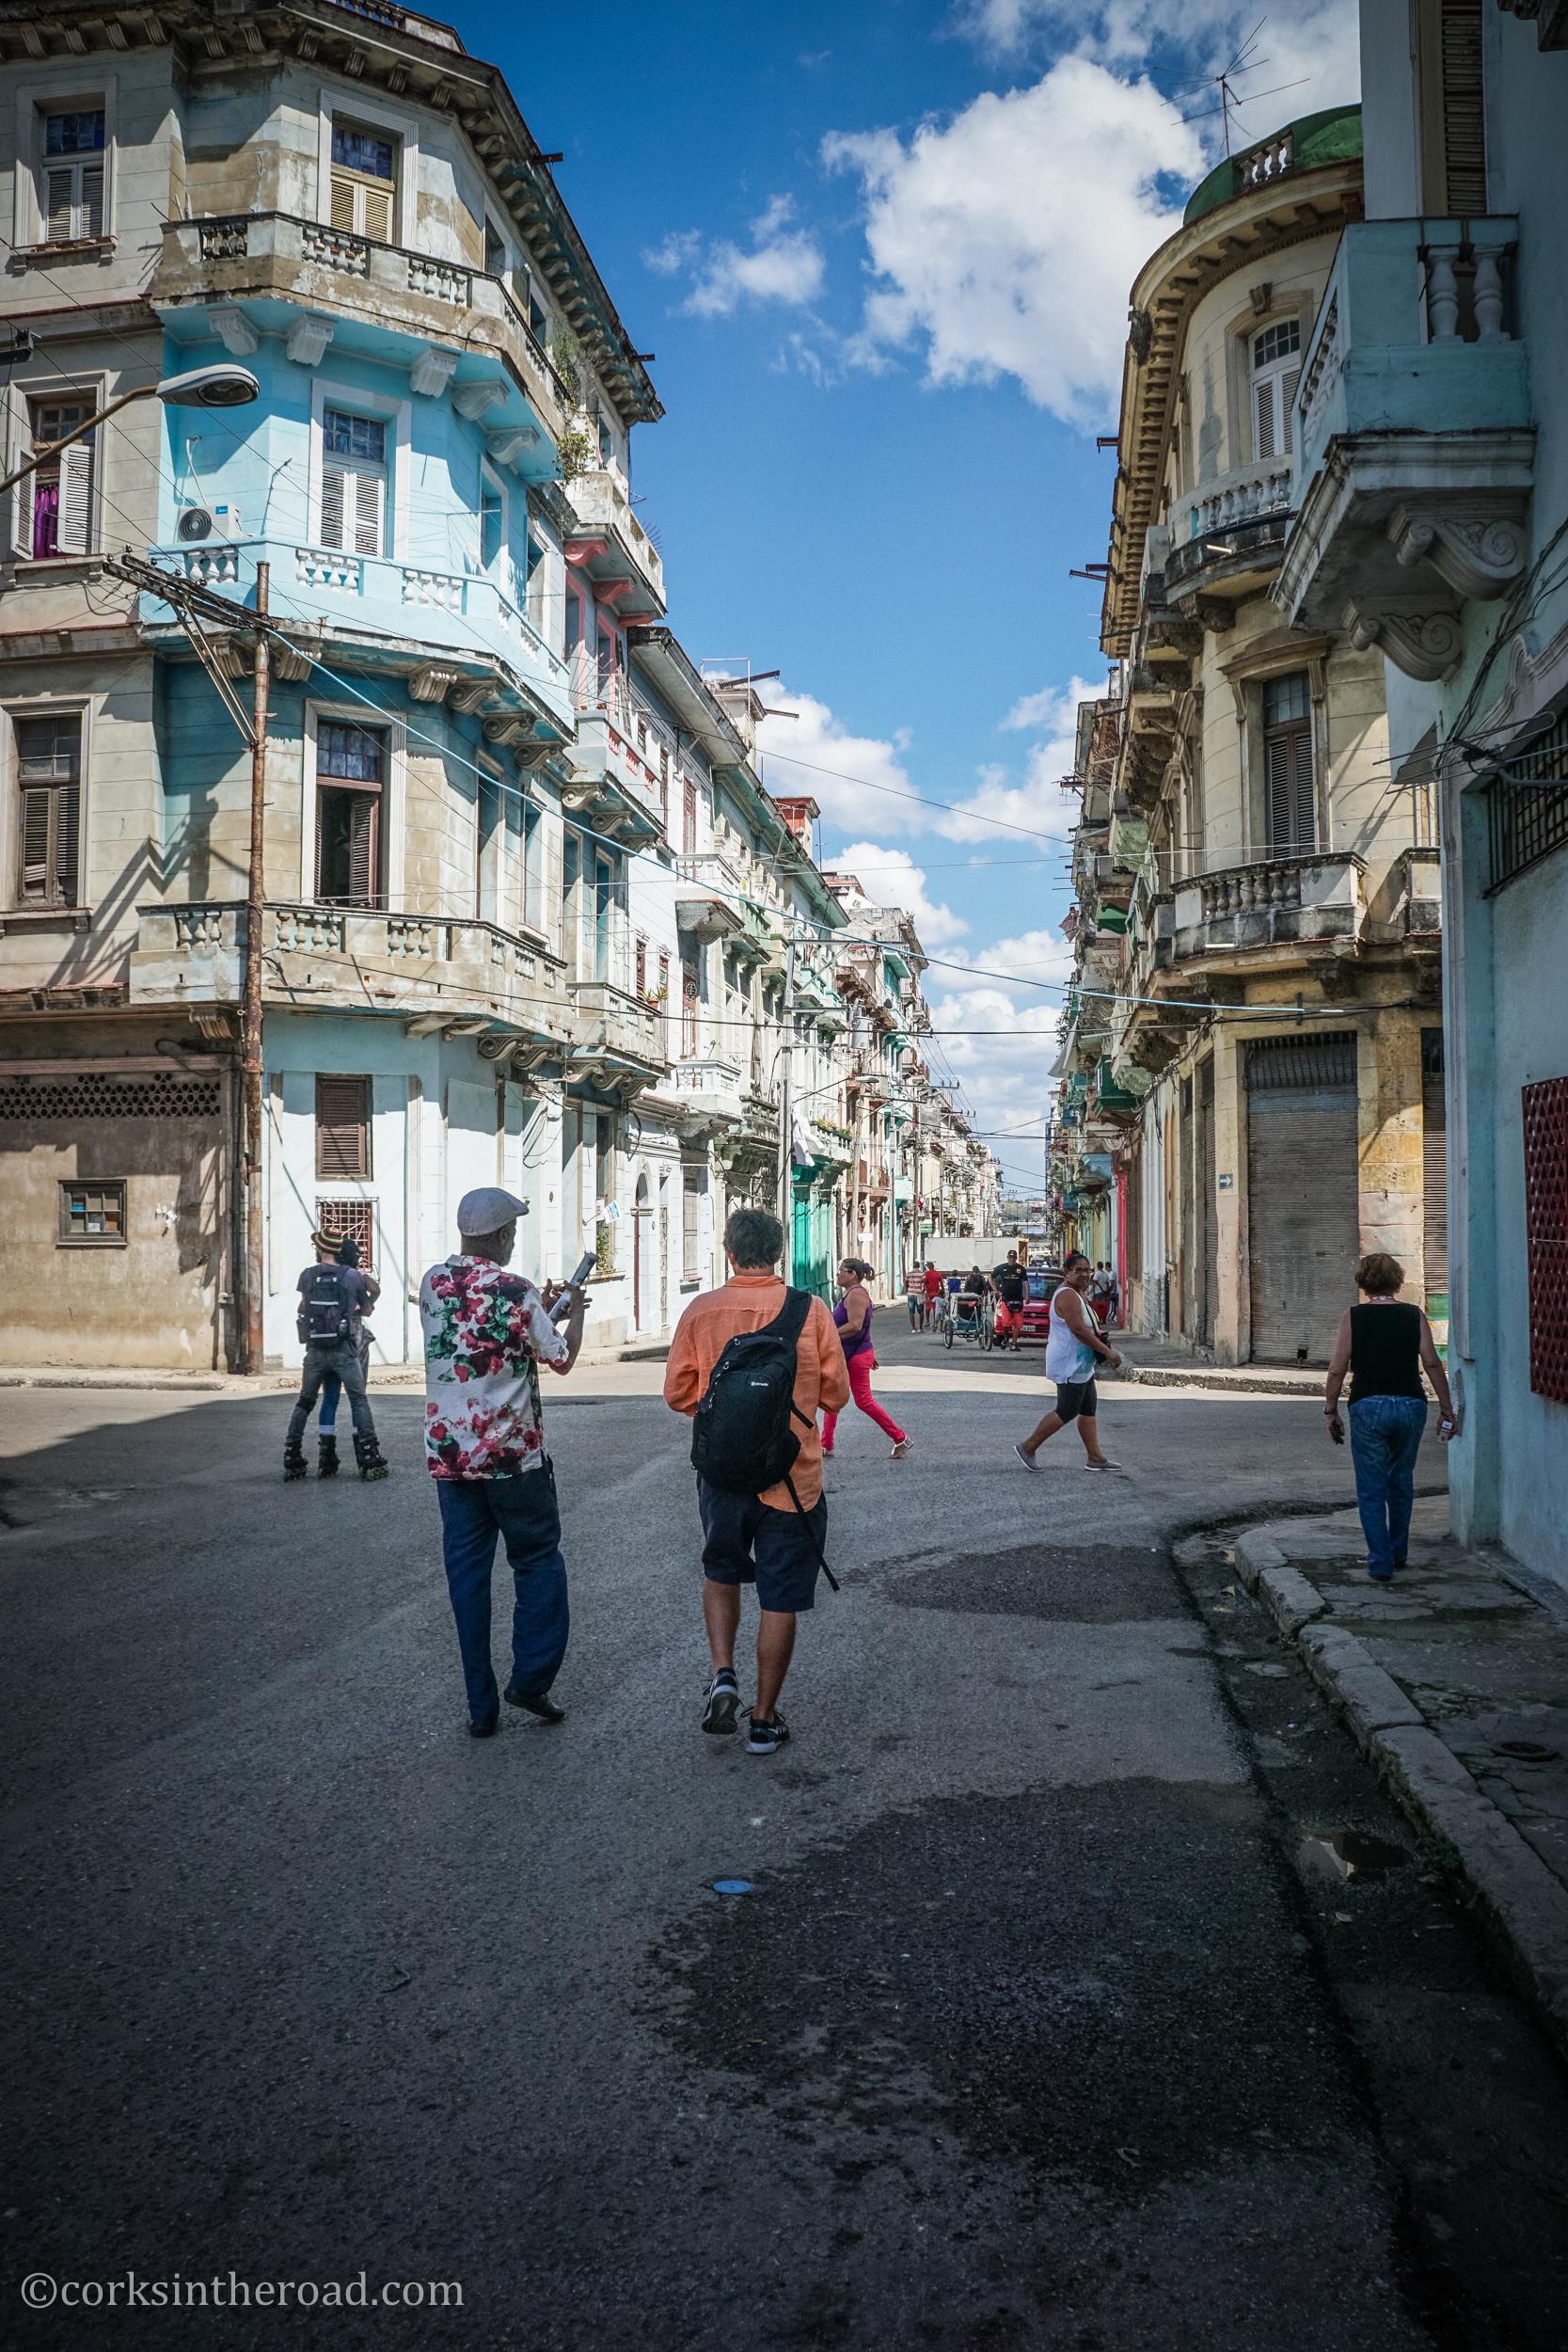 Architecture, Corksintheroad, Cuba, Havana, Hubs.jpg